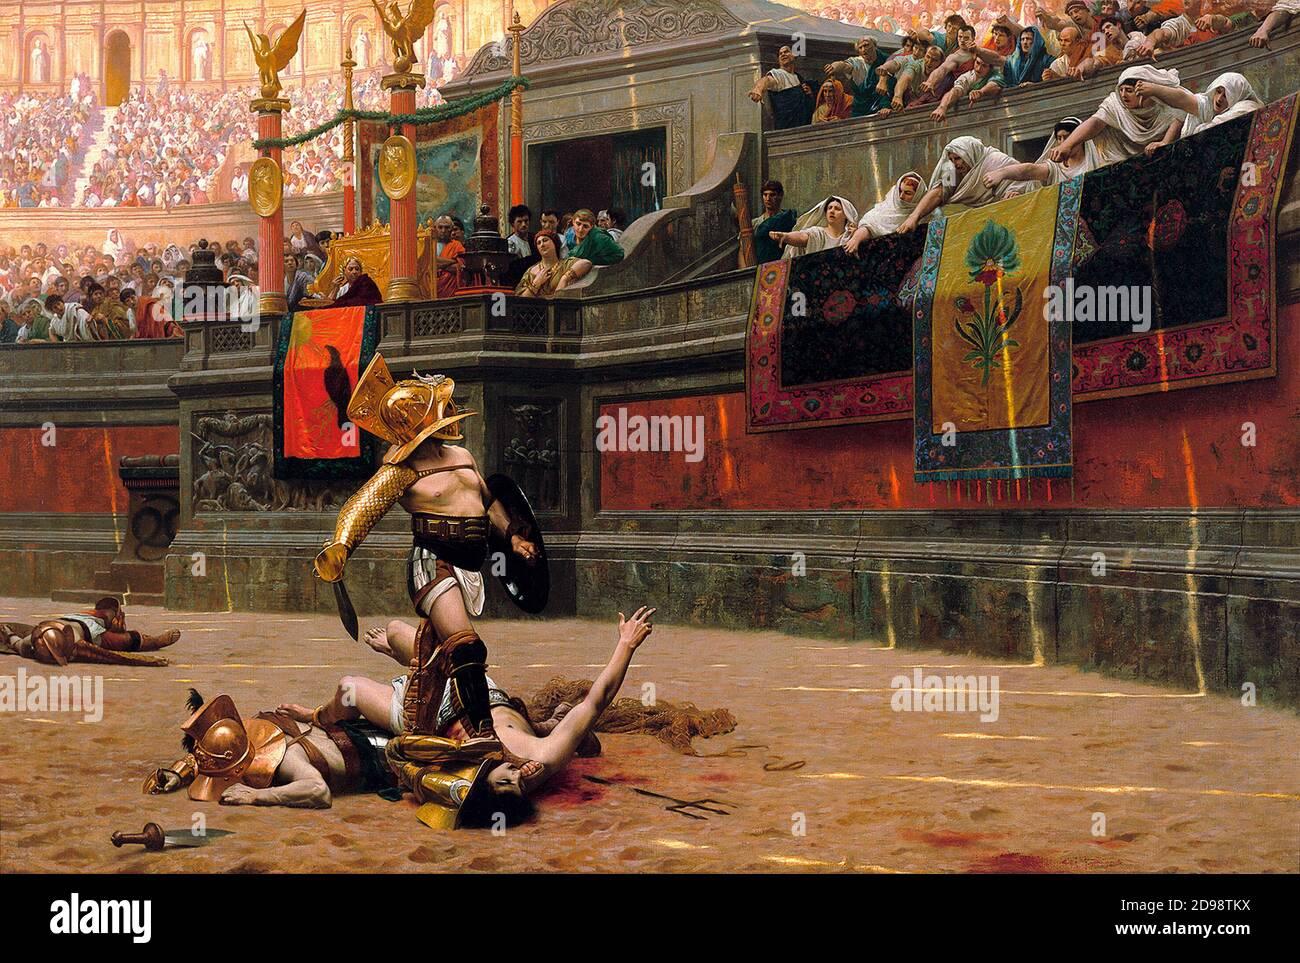 Roman Gladiator / Gladiators. Pollice Verso (Thumbs Down) by Jean-Léon Gérôme (1824-1904), oil on canvas, 1872. Stock Photo